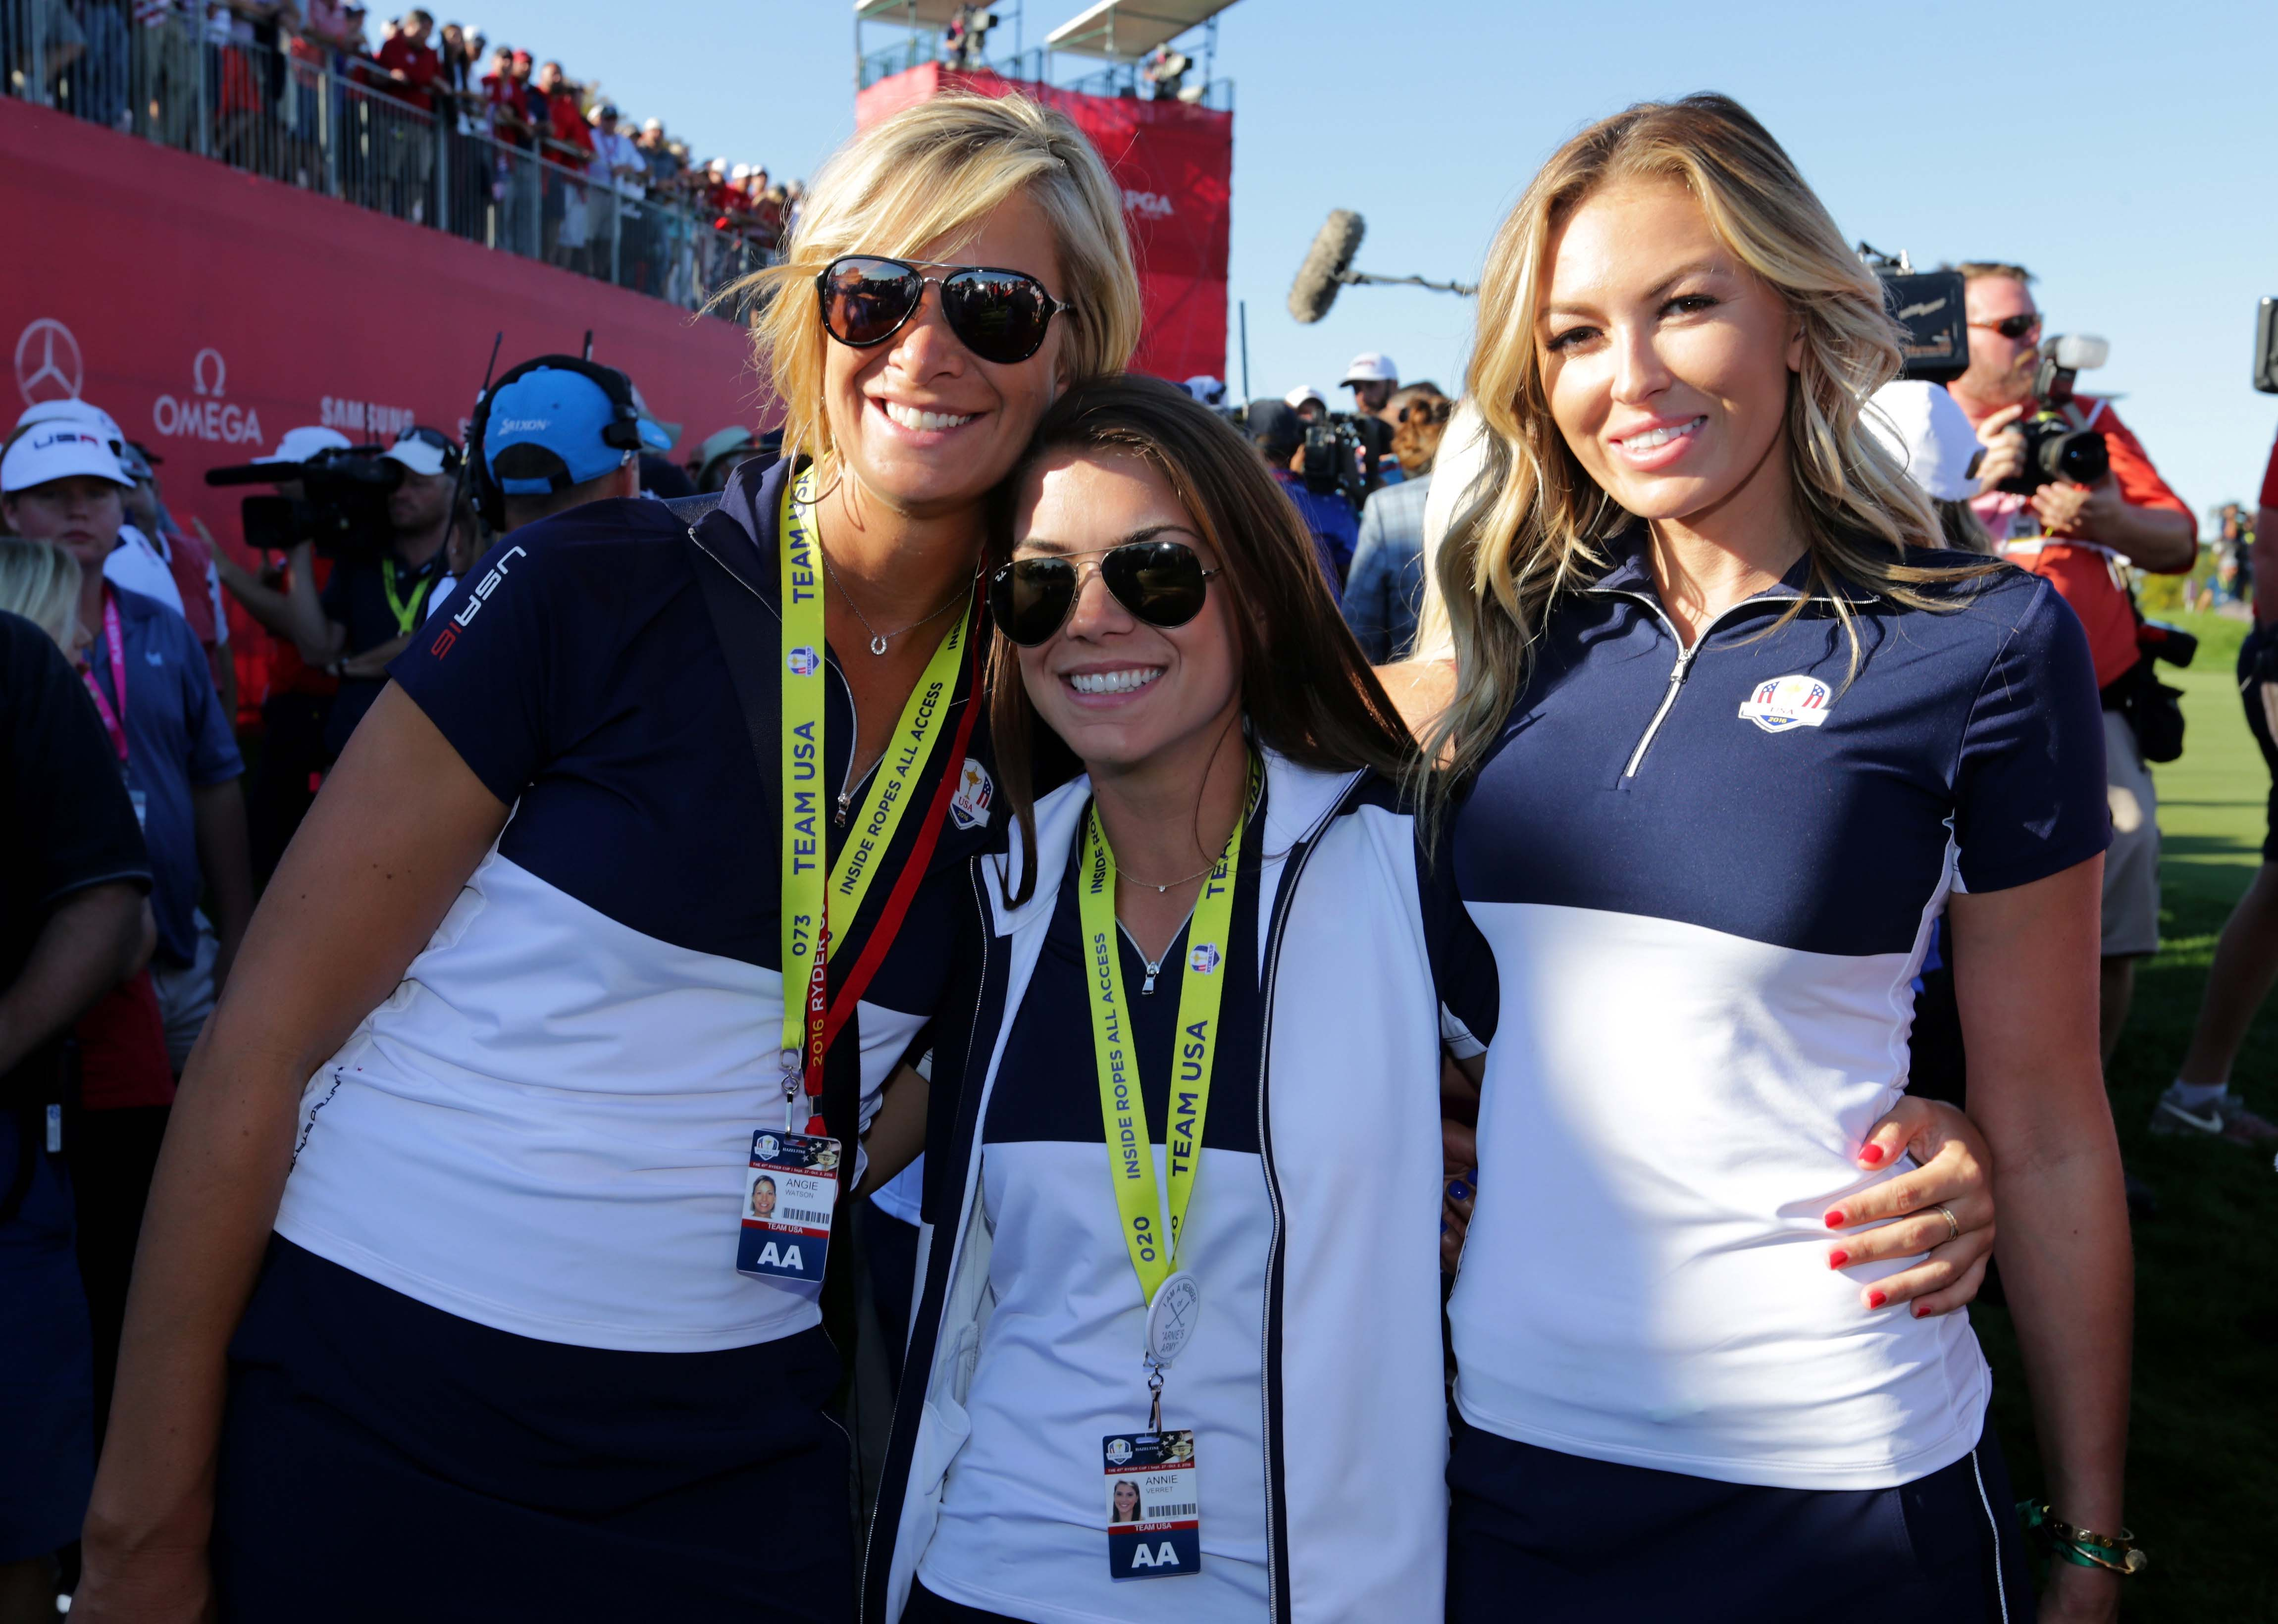 Angie Watson, Annie Verret and Paulina Gretzky